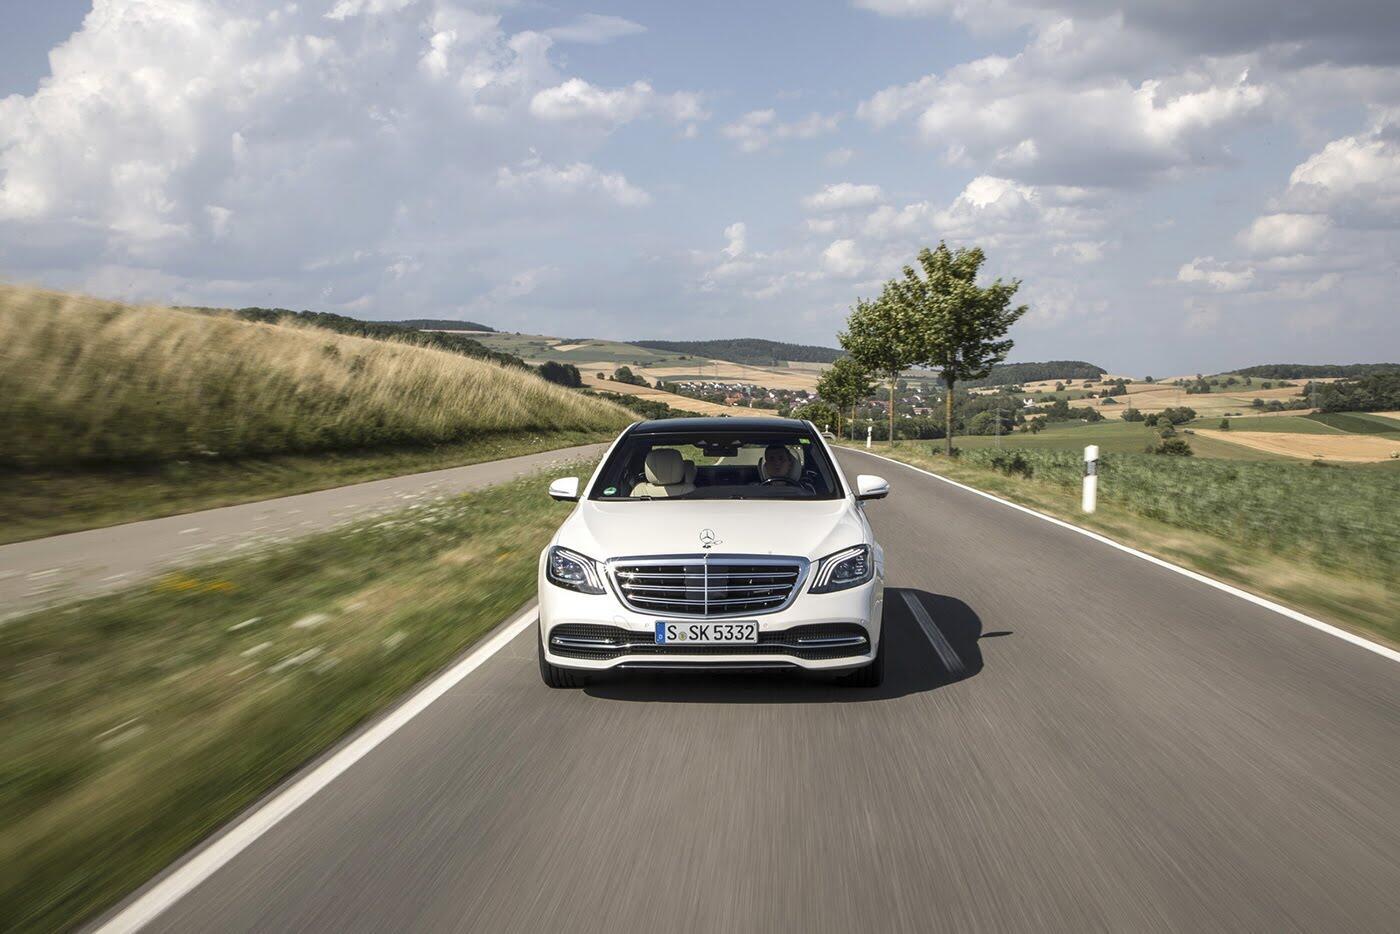 Ảnh chi tiết Mercedes-Benz S-Class 2018 - Hình 32